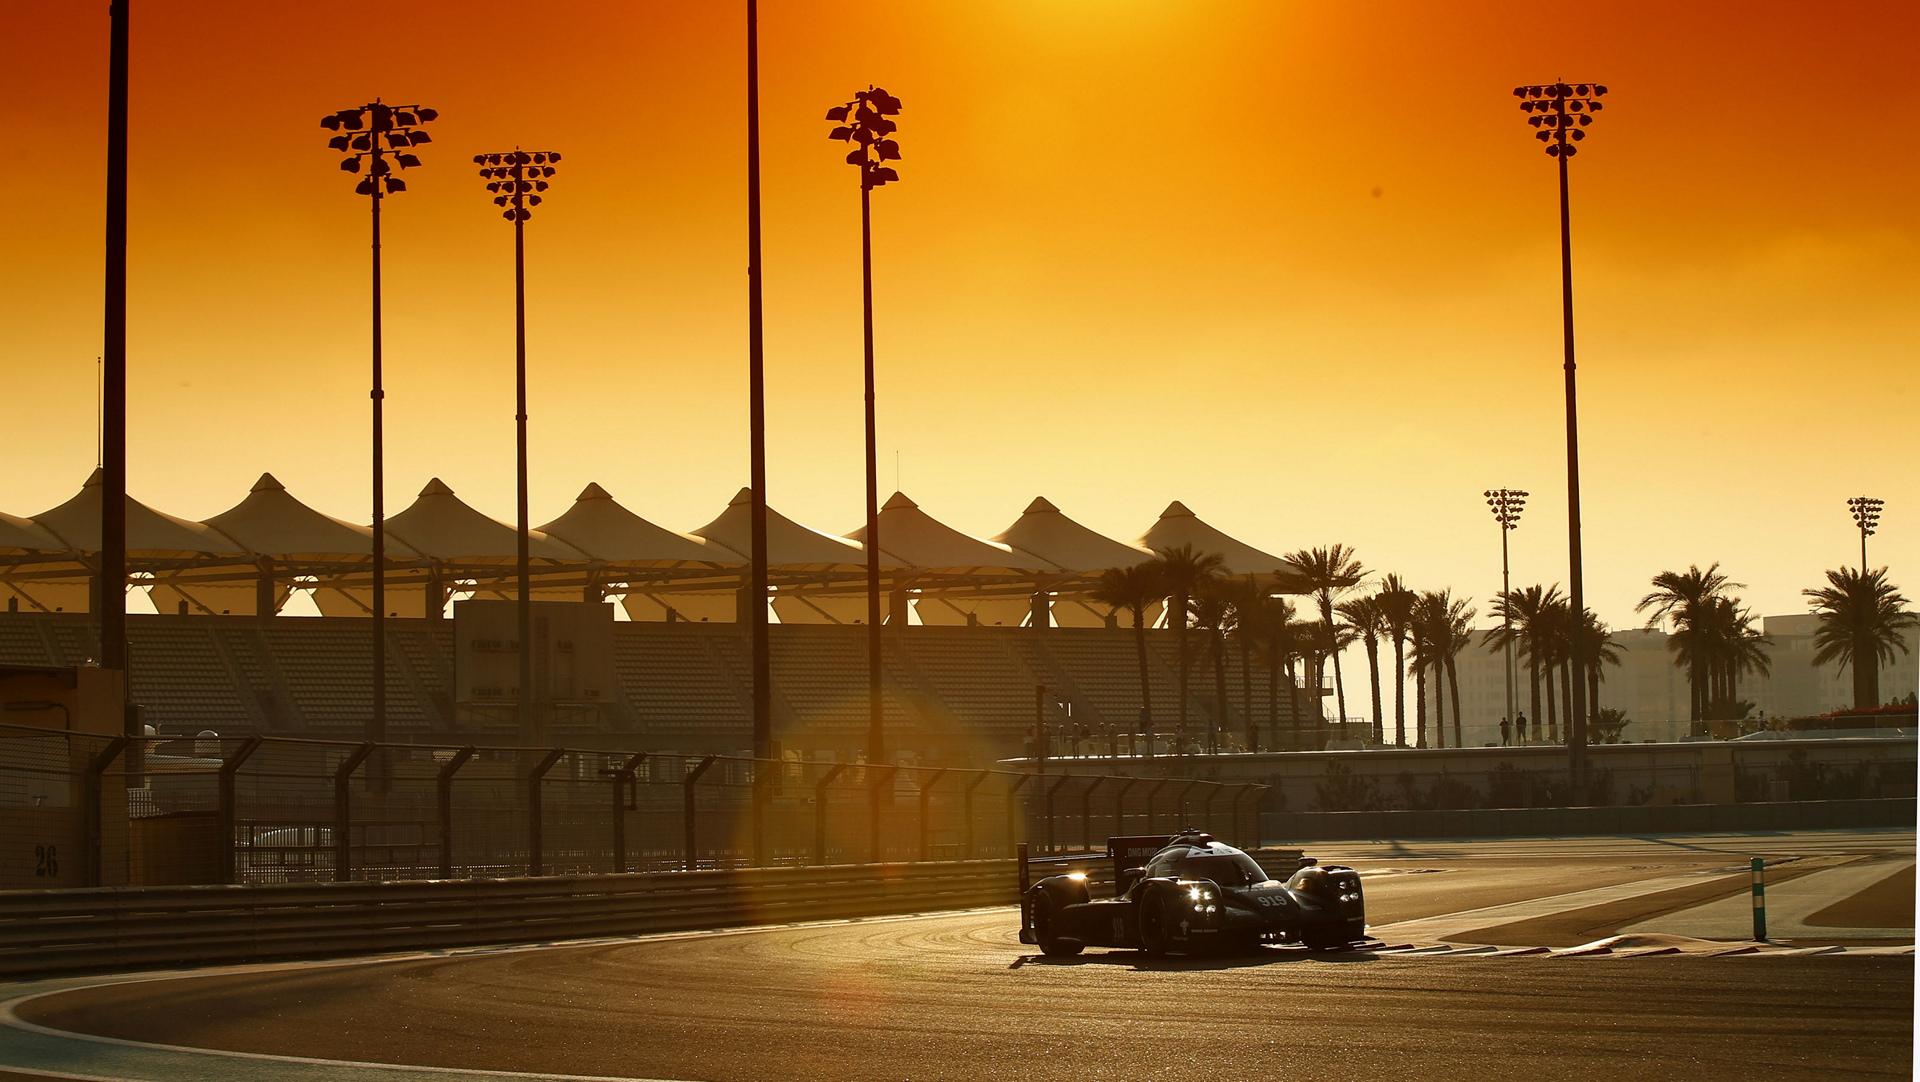 Porsche 919 Hybrid, Porsche Team: Timo Bernhard, Brendon Hartley, Mark Webber, Test Abu Dhabi © Dr. Ing. h.c. F. Porsche AG